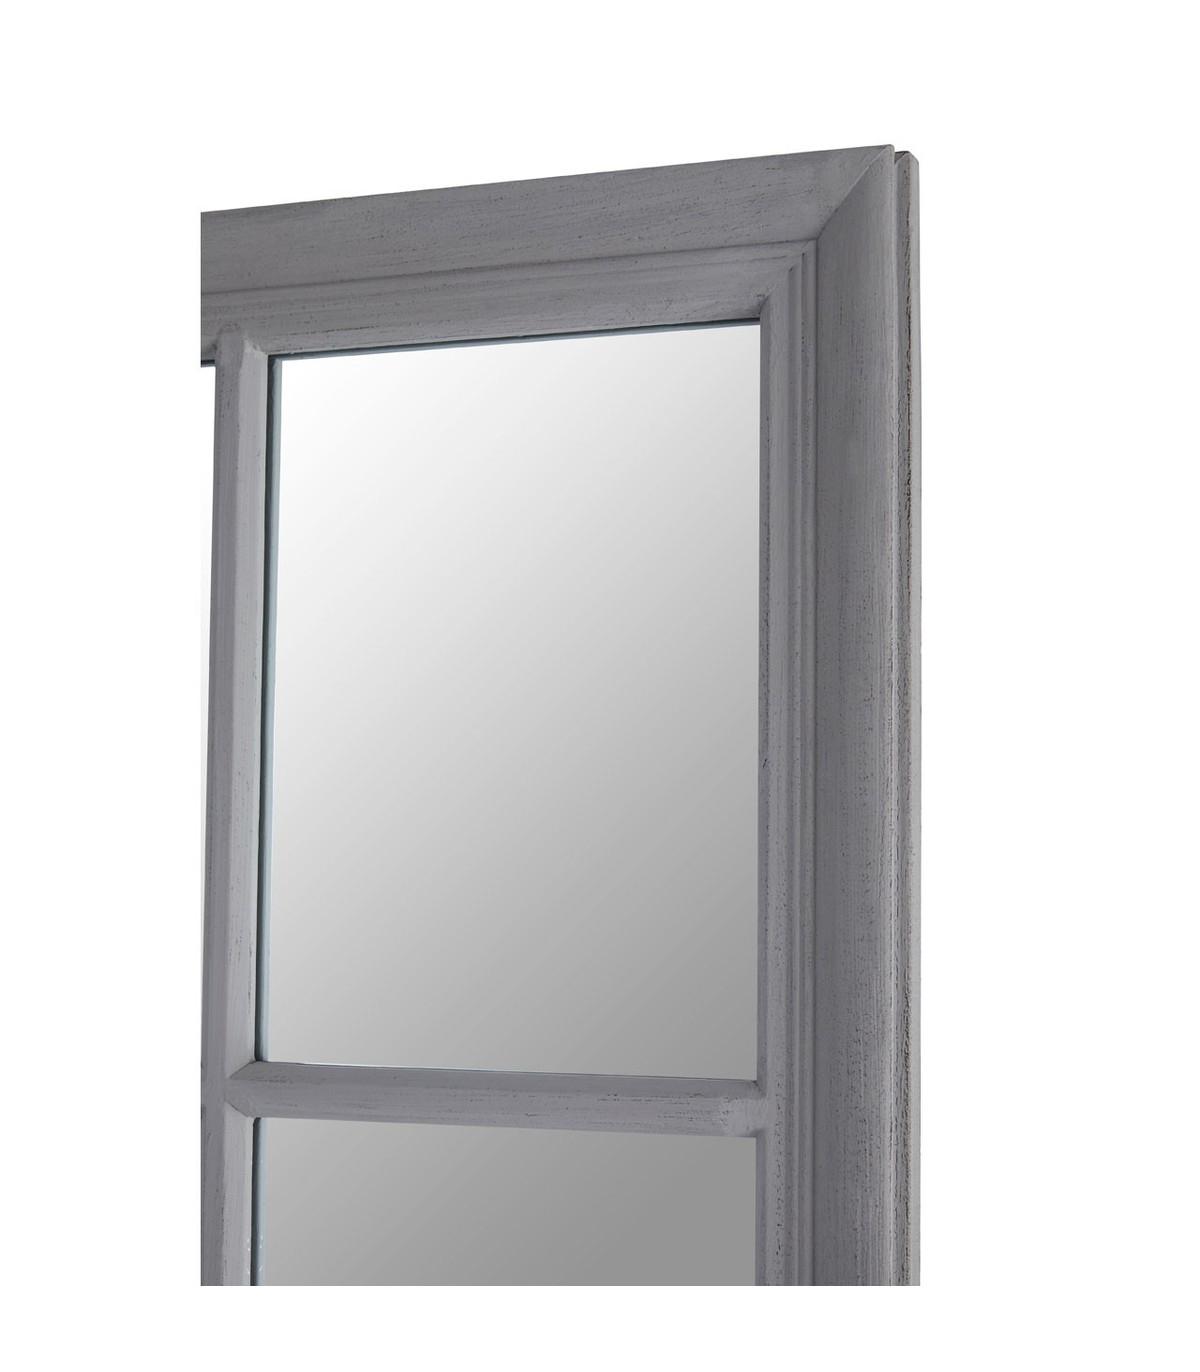 Grey Flat Wood Wall Mirror In Popular Flat Wall Mirrors (View 10 of 20)